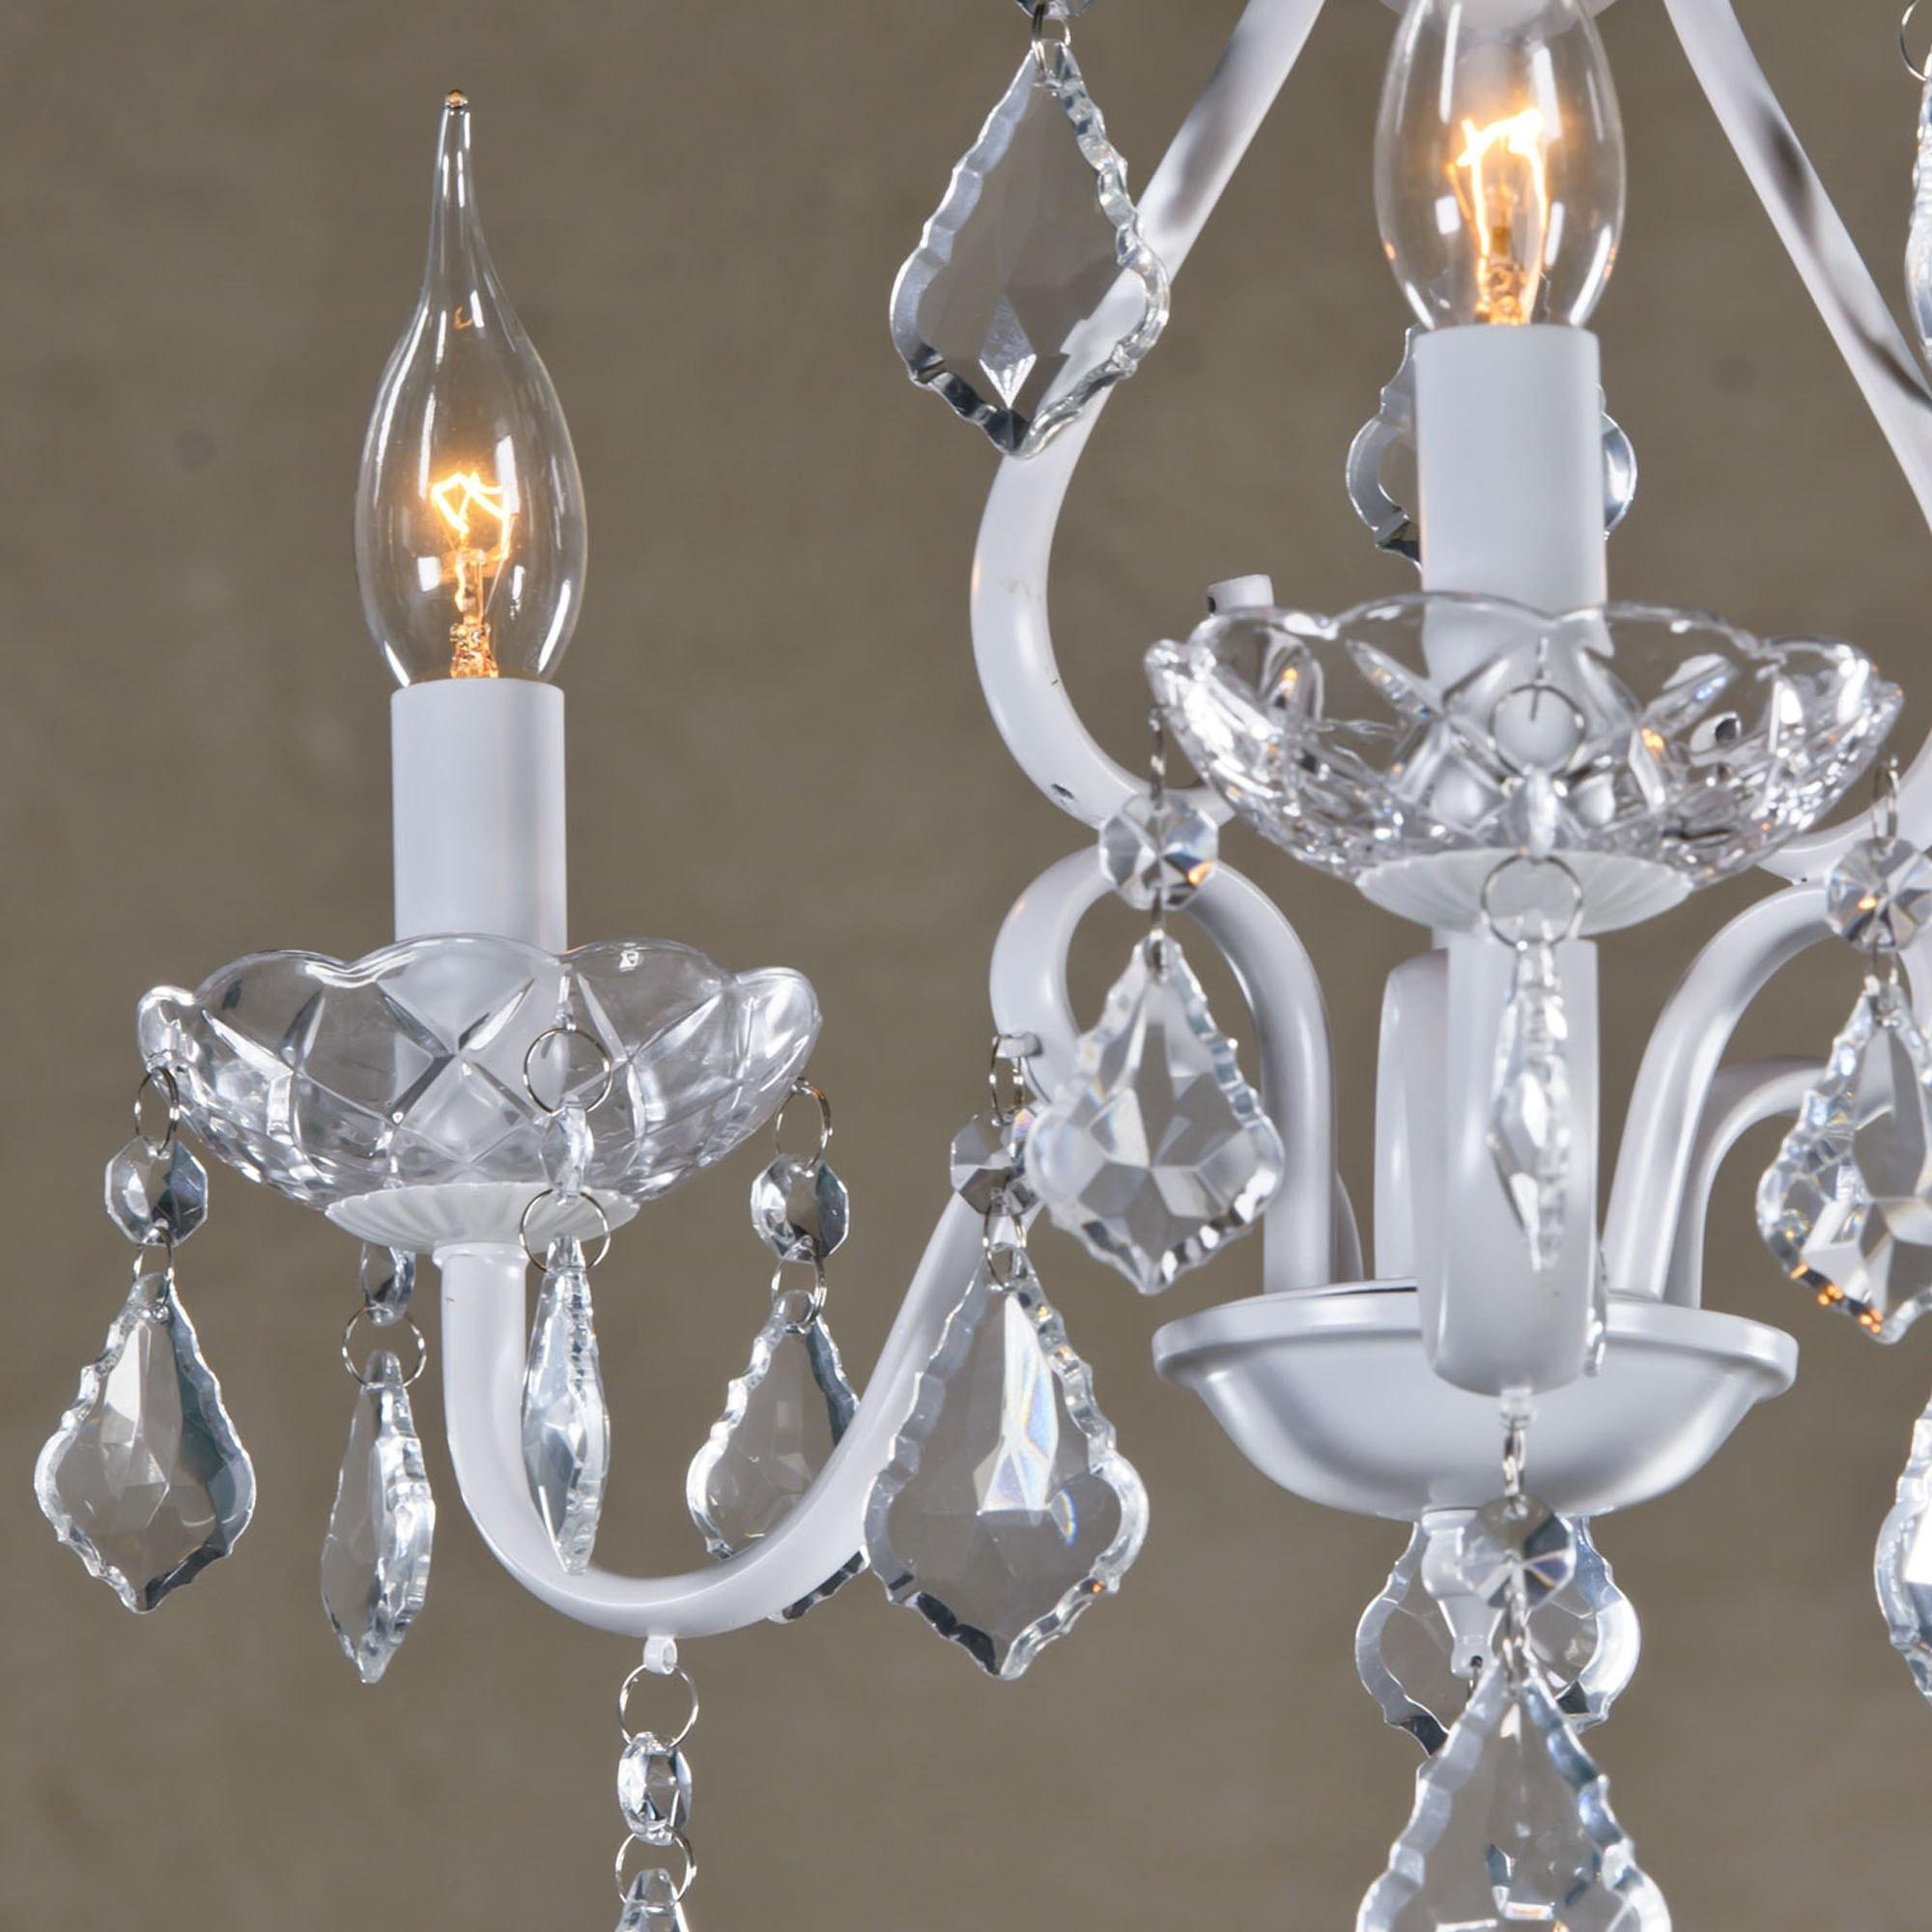 White & Clear Vintage 3 Light Chandelier